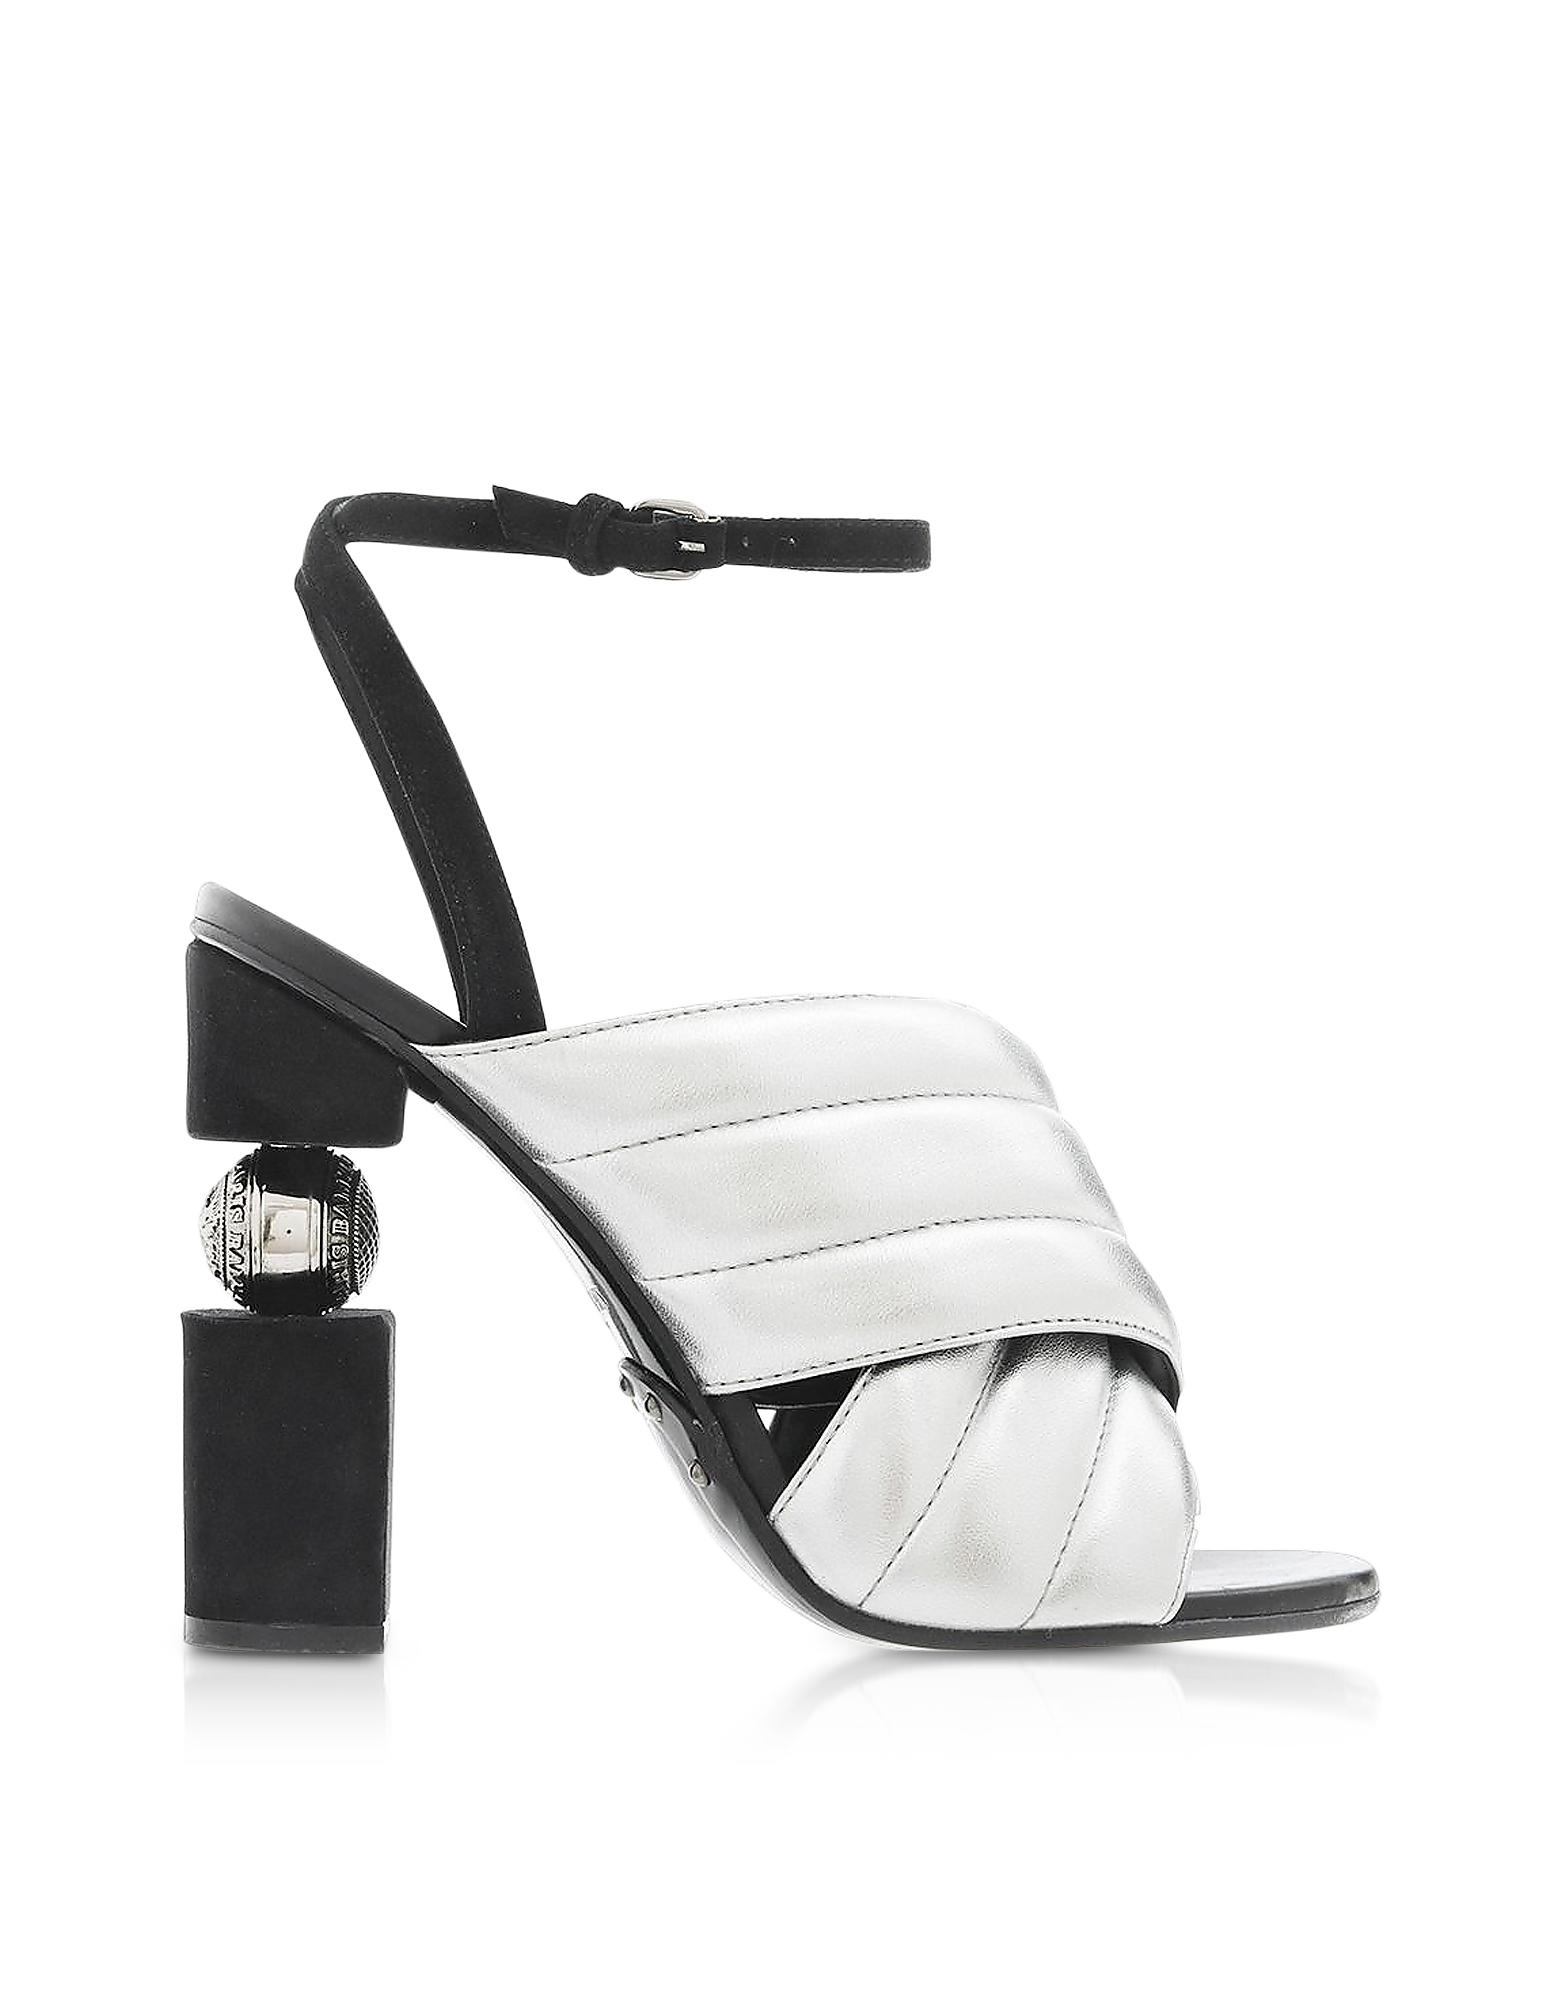 Balmain Designer Shoes, Jana Silver Laminated High Heel Sandals